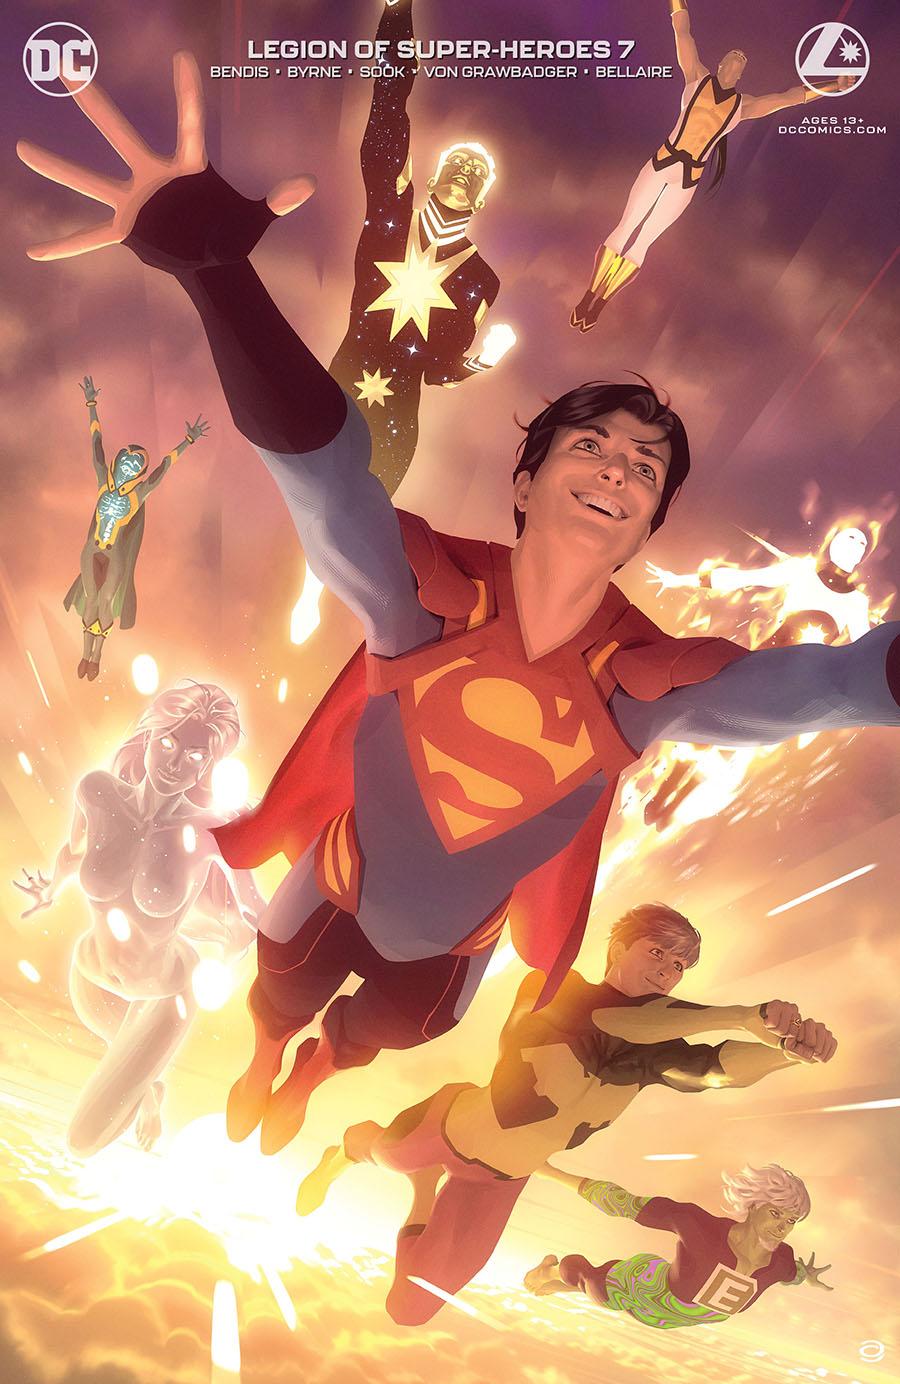 Legion Of Super-Heroes Vol 8 #7 Cover B Variant Alex Garner Card Stock Cover